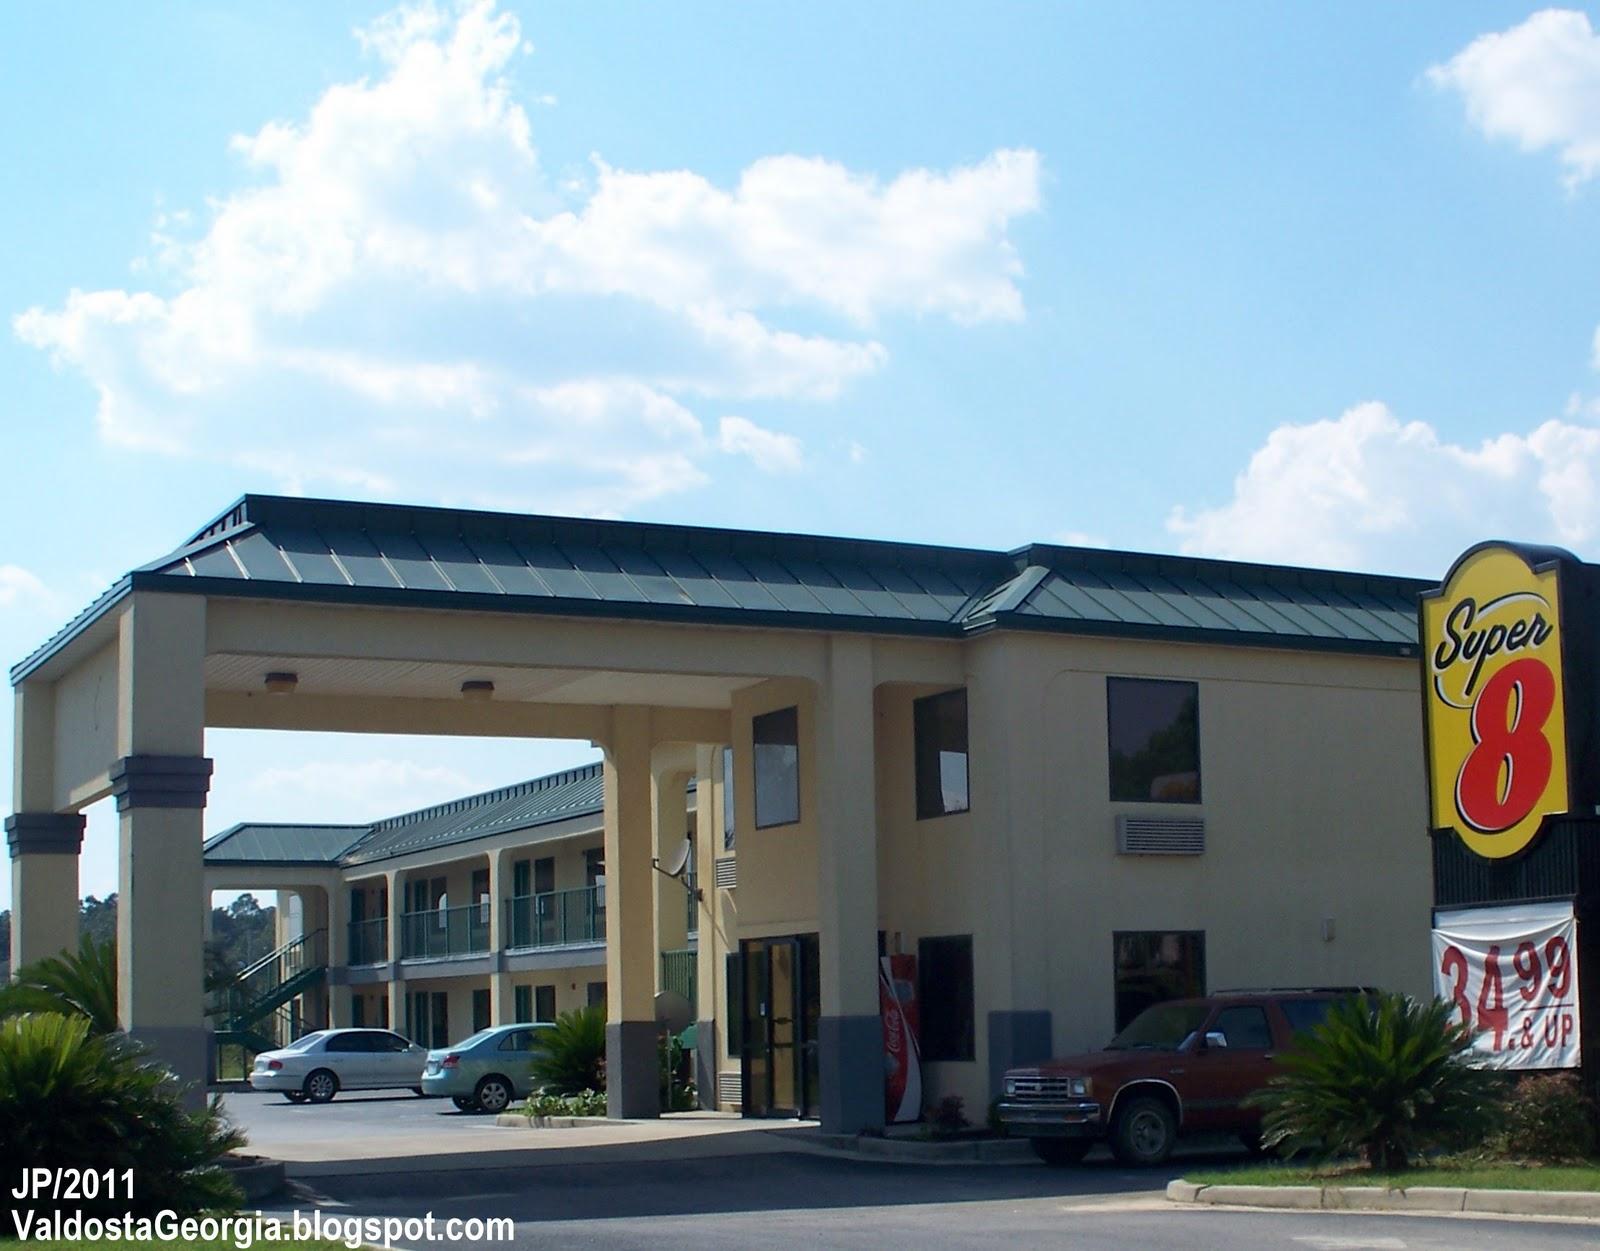 Super 8 Hotel Lake Park Georgia Valdosta Lowndes County Lodging Ga I 75 Lakes Blvd Exit